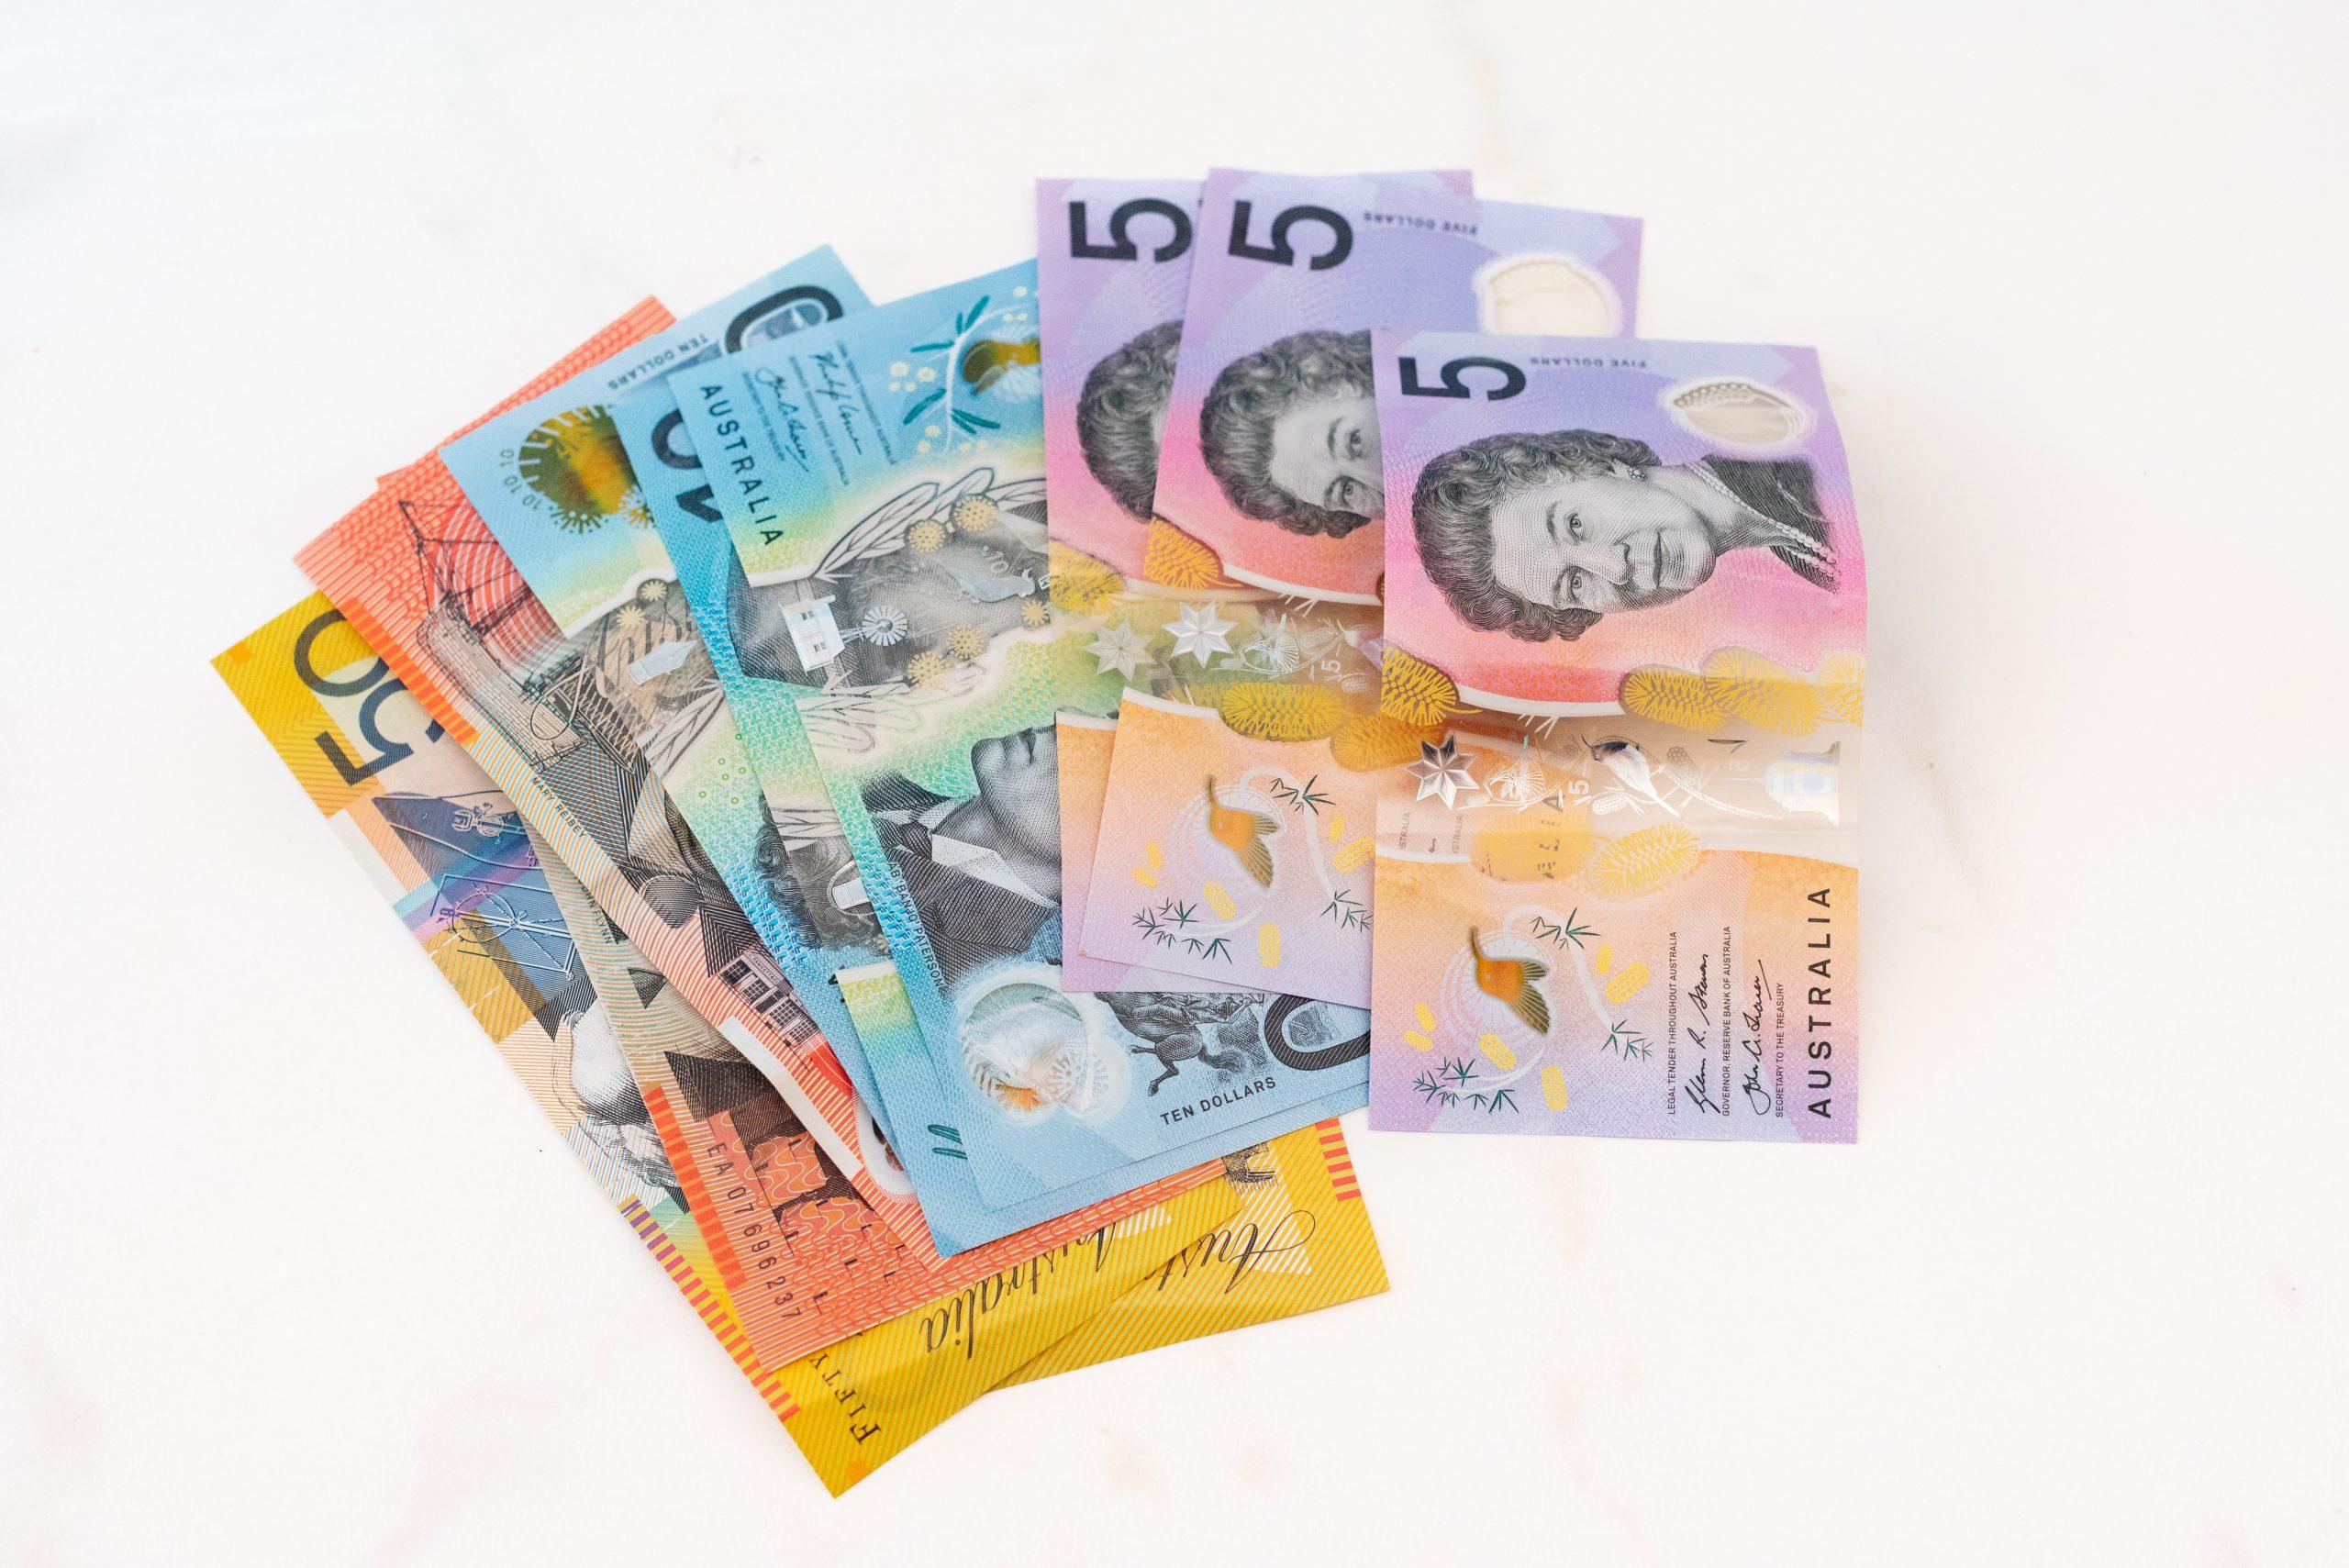 7 ways to make $100 Drastically Improve your Finances